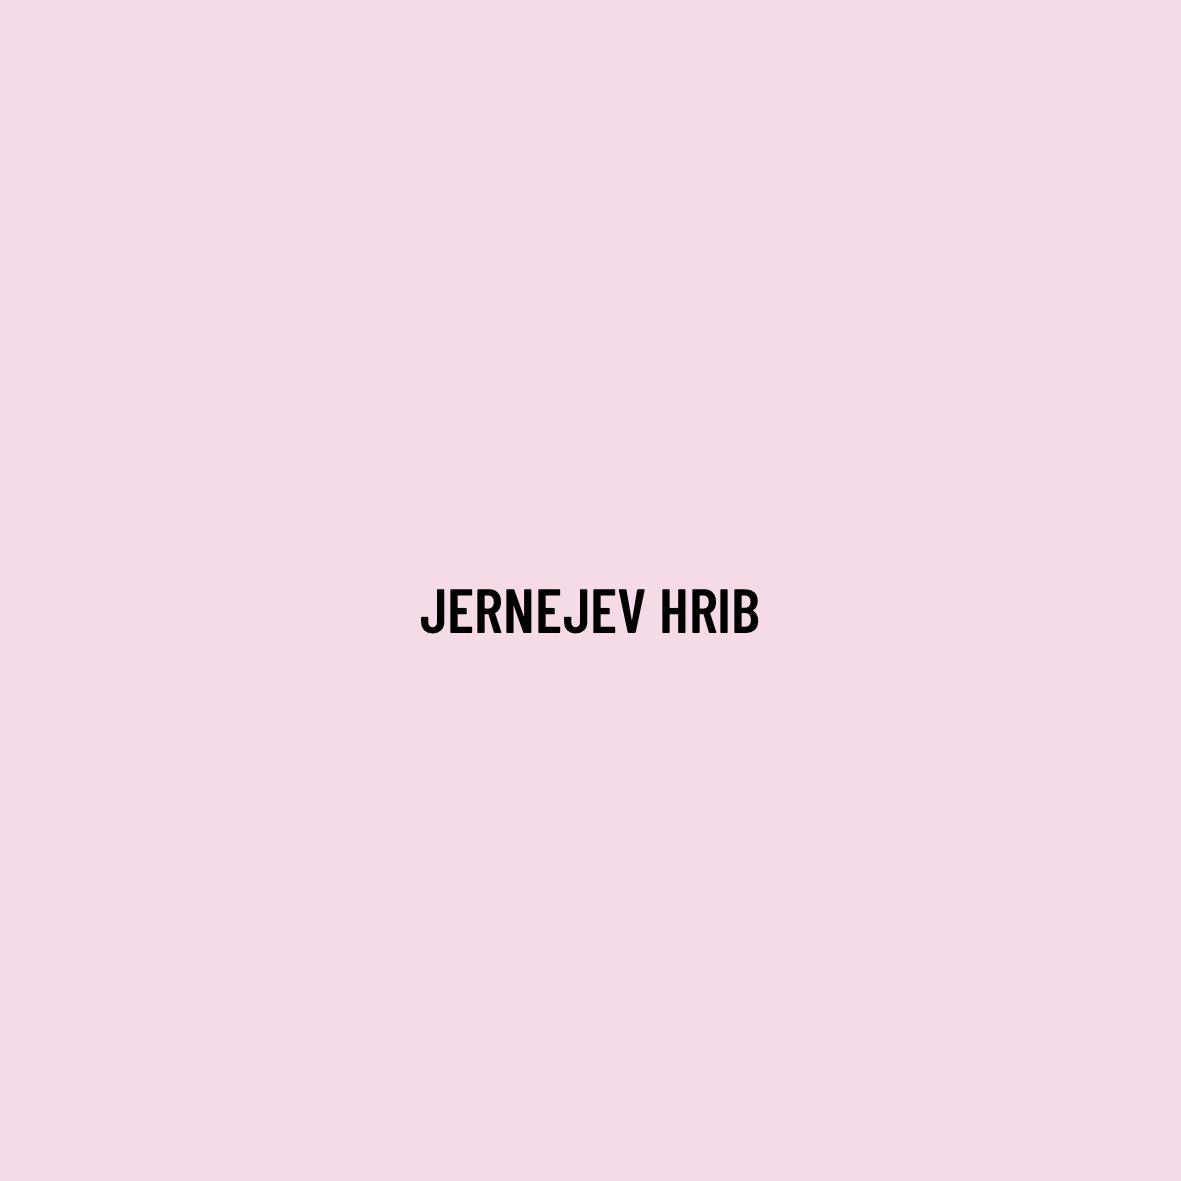 Jernejev hrib_net